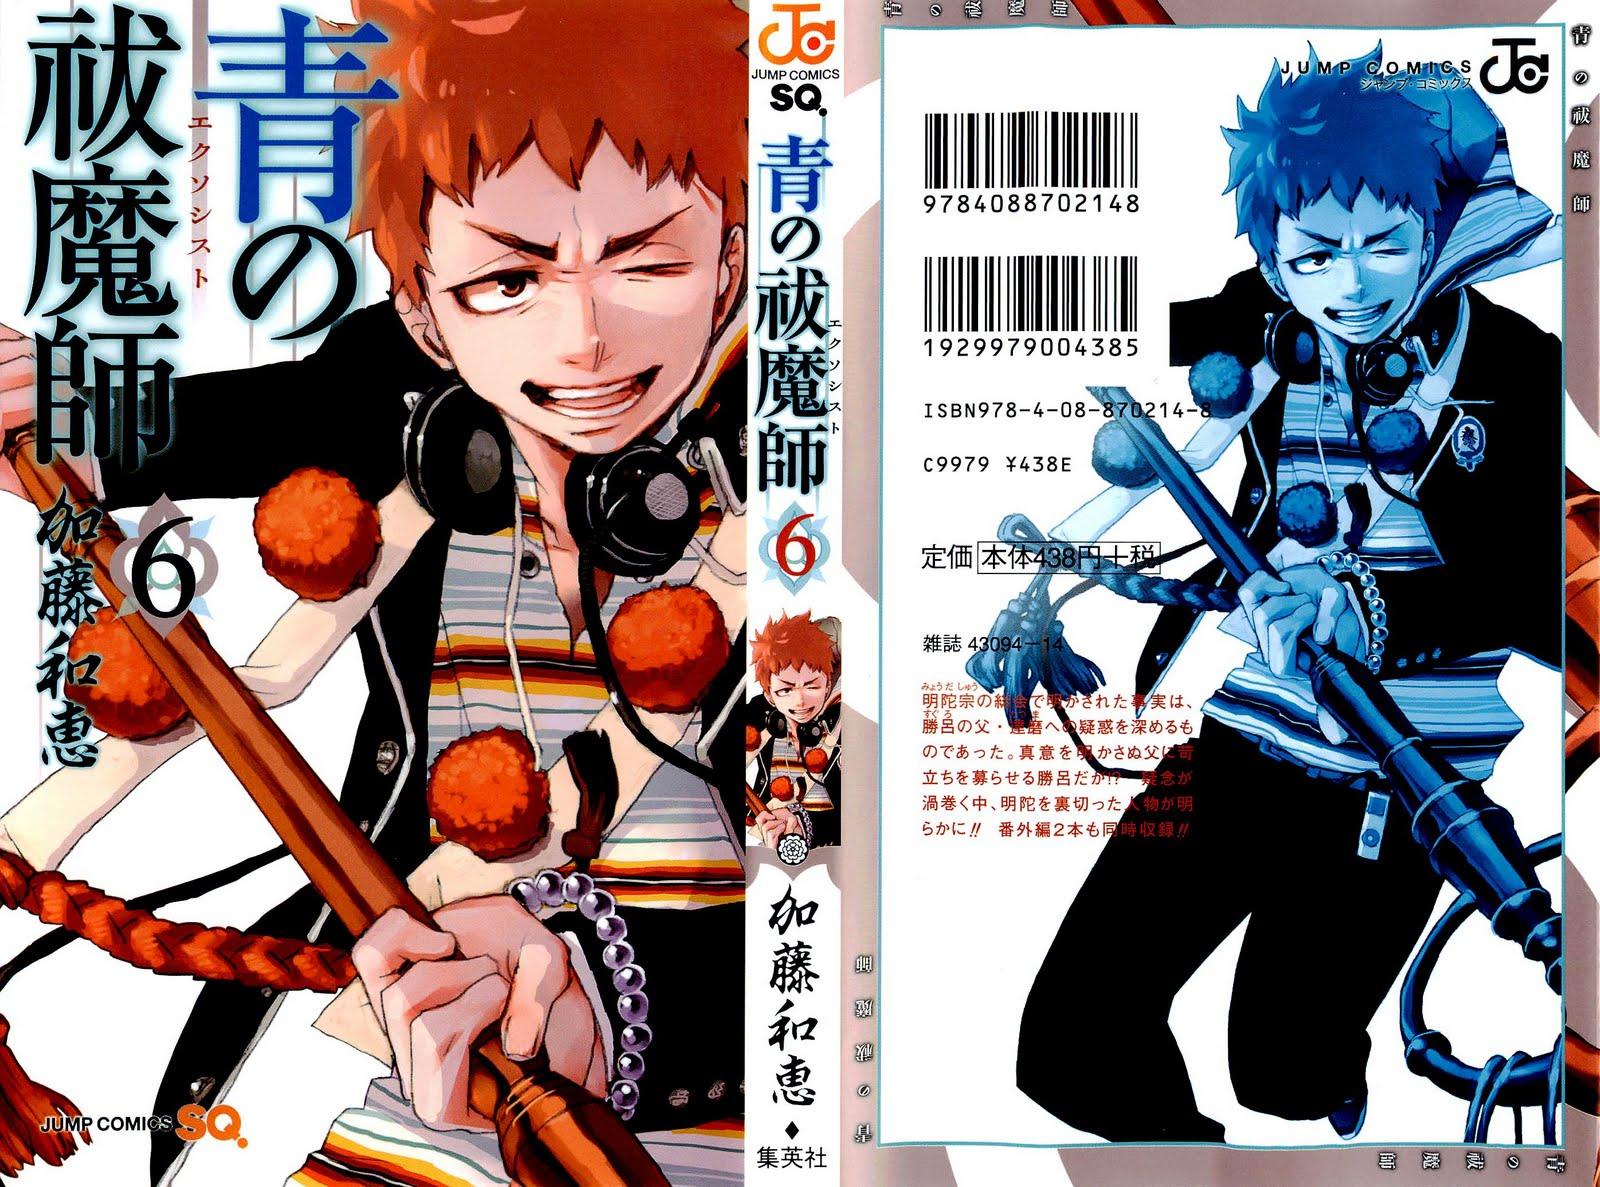 Shima Renzou Ao No Exorcist Image 728261 Zerochan Anime Image Board